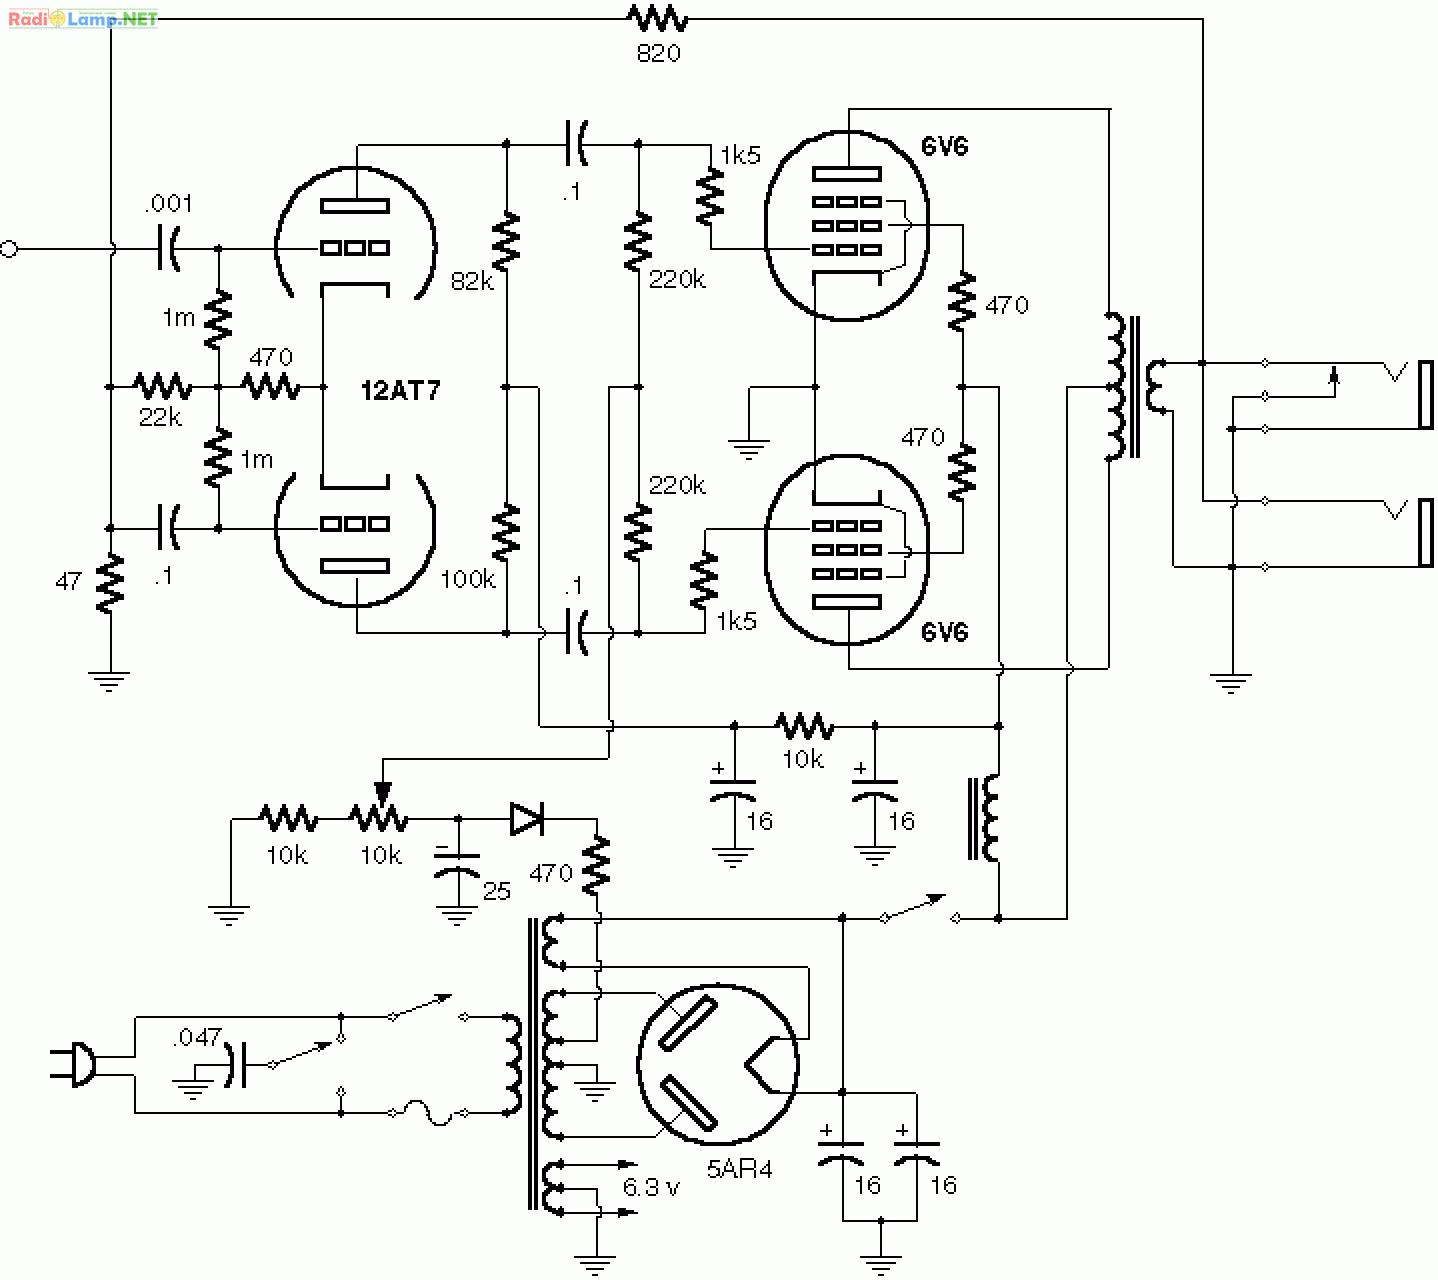 radio wiring diagram for mercedes sprinter radio 2007 mercedes sprinter radio wiring diagram 2007 discover your on radio wiring diagram for mercedes sprinter